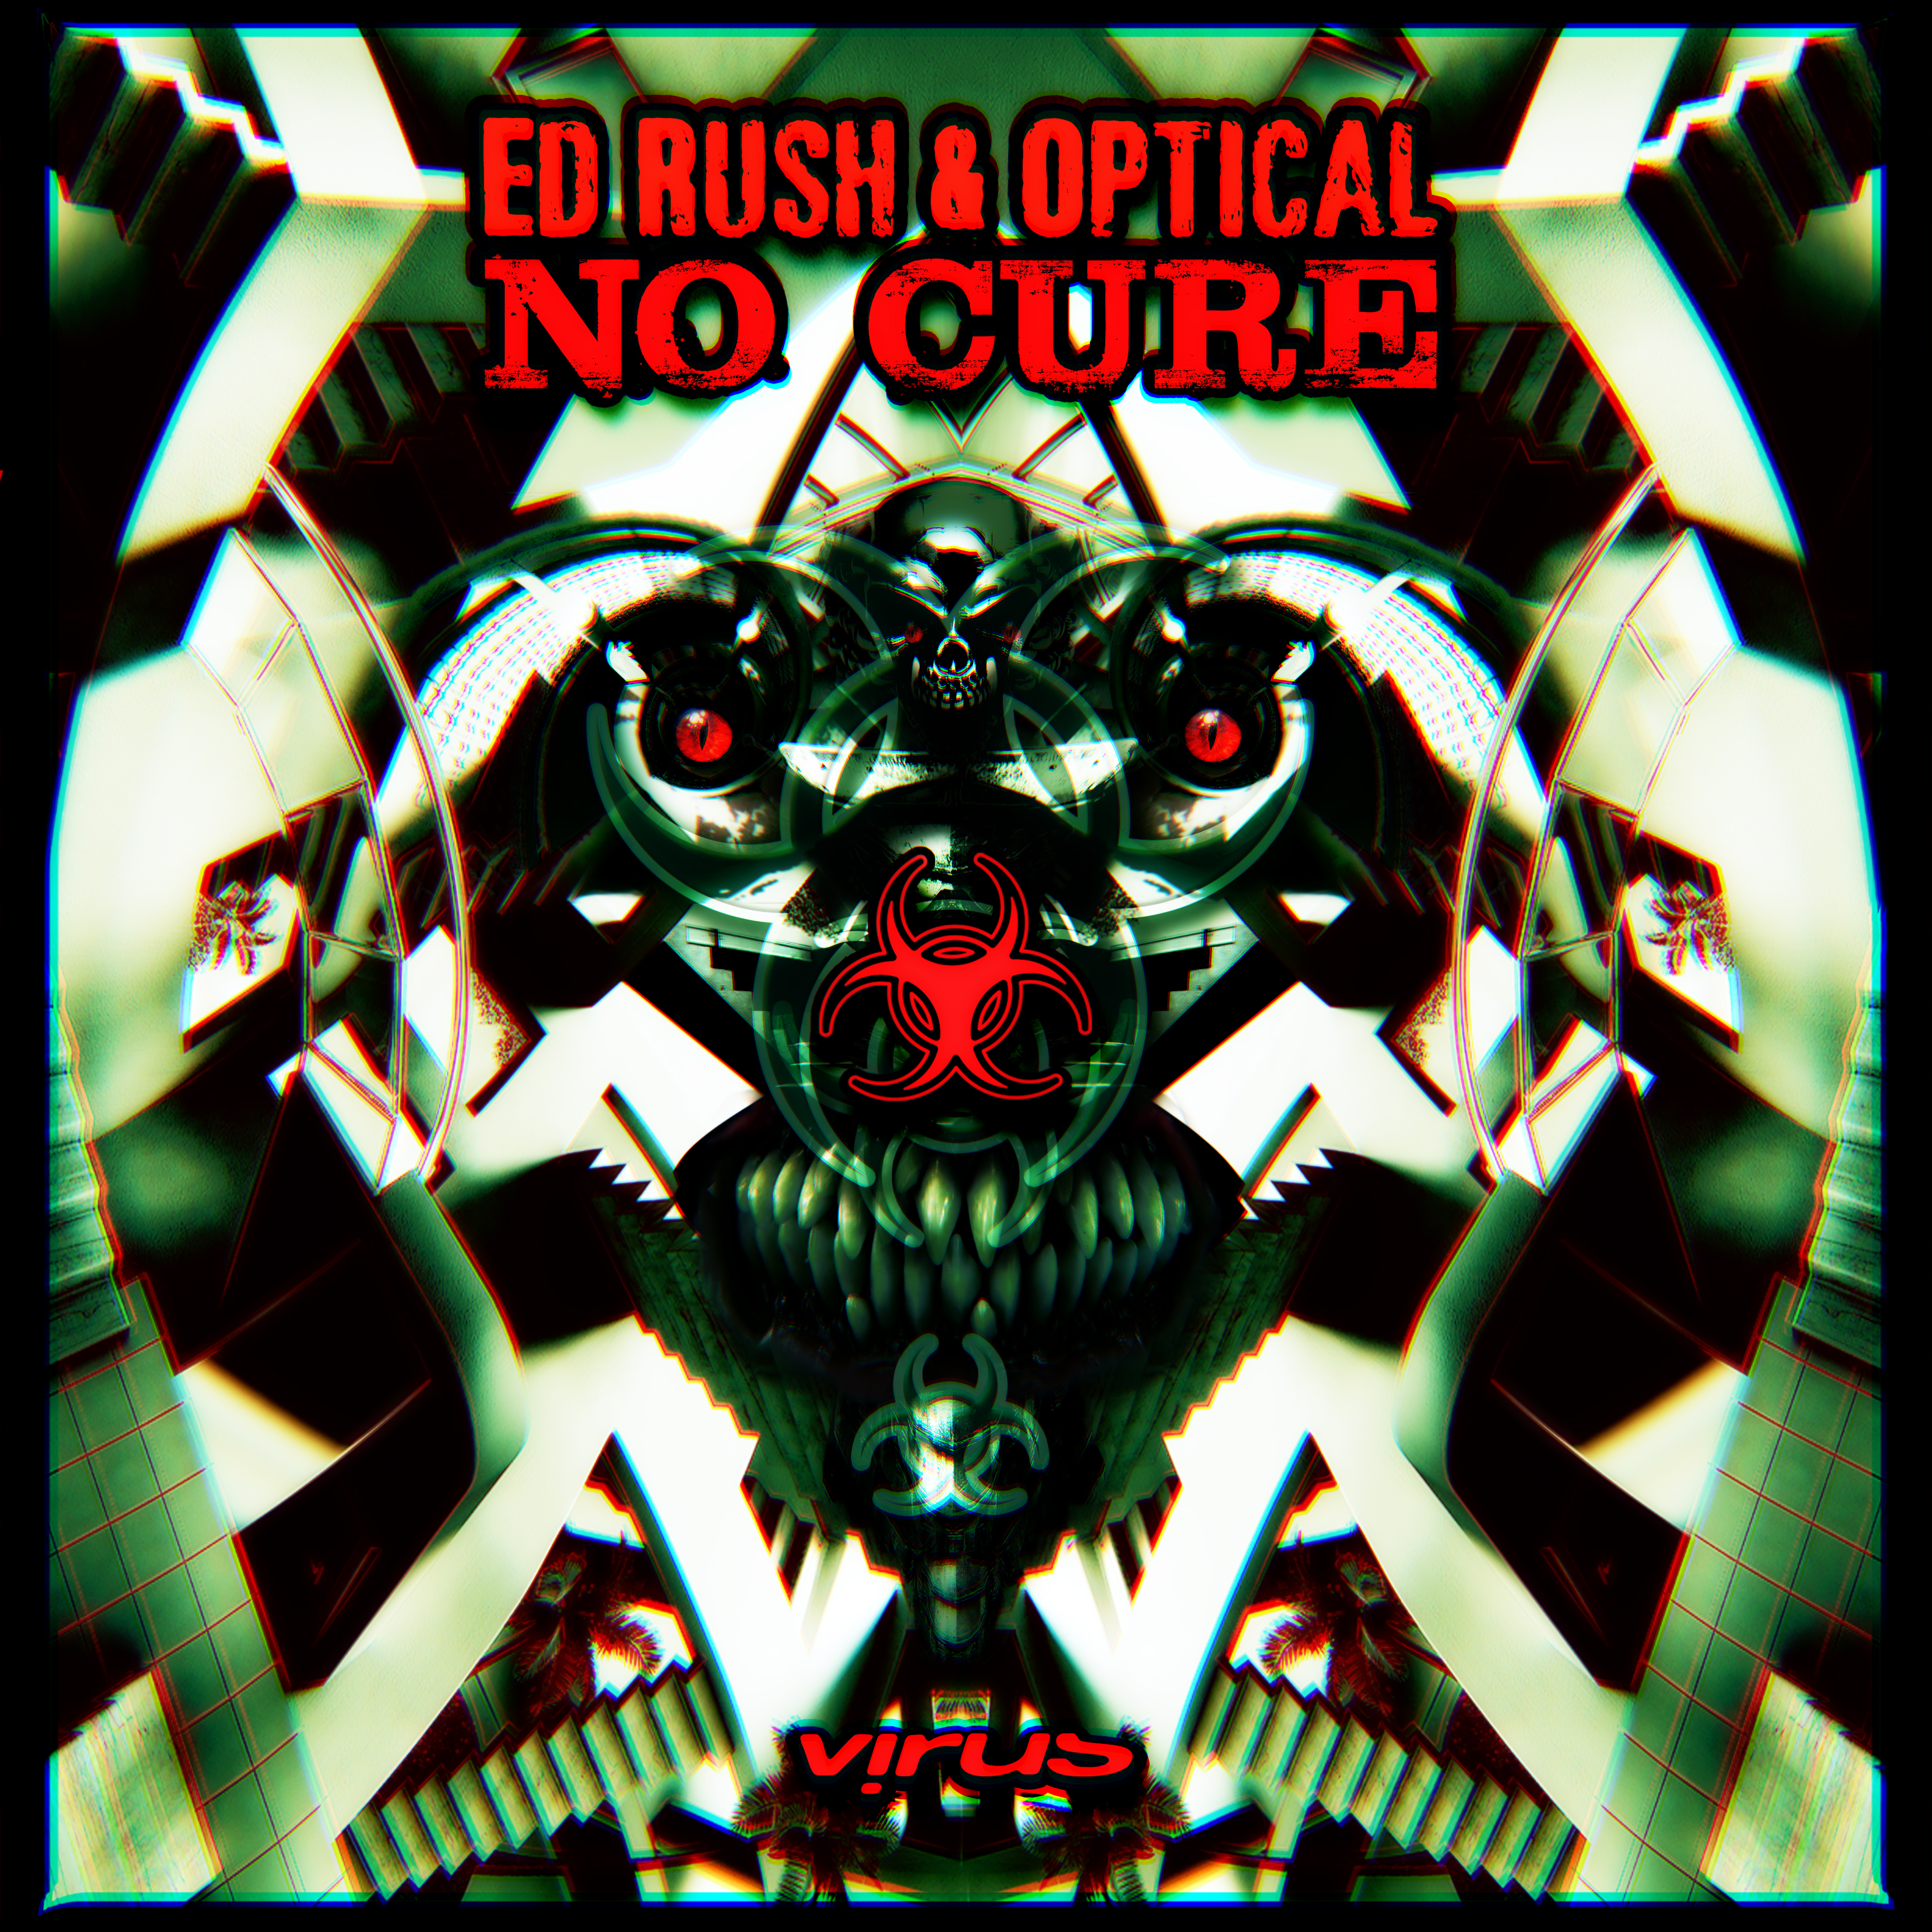 Ed Rush & Optical/NO CURE CD